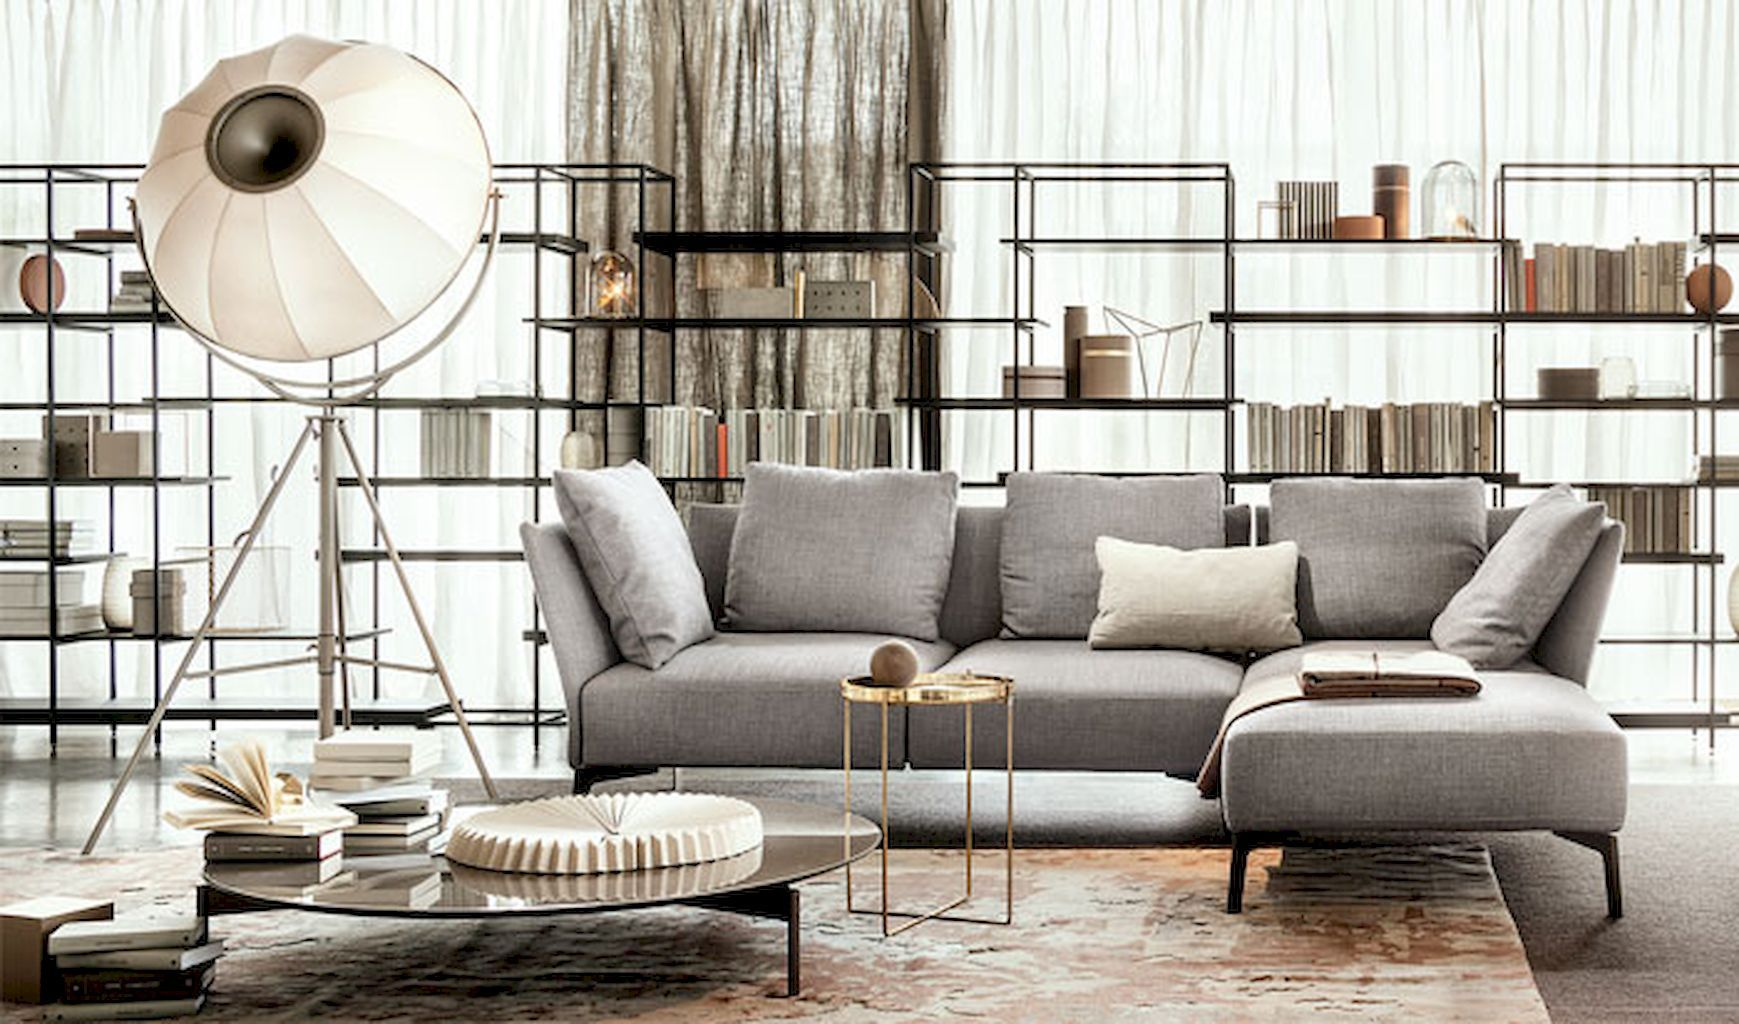 50 Apartment Living Room Designs Ideas Trends 2018